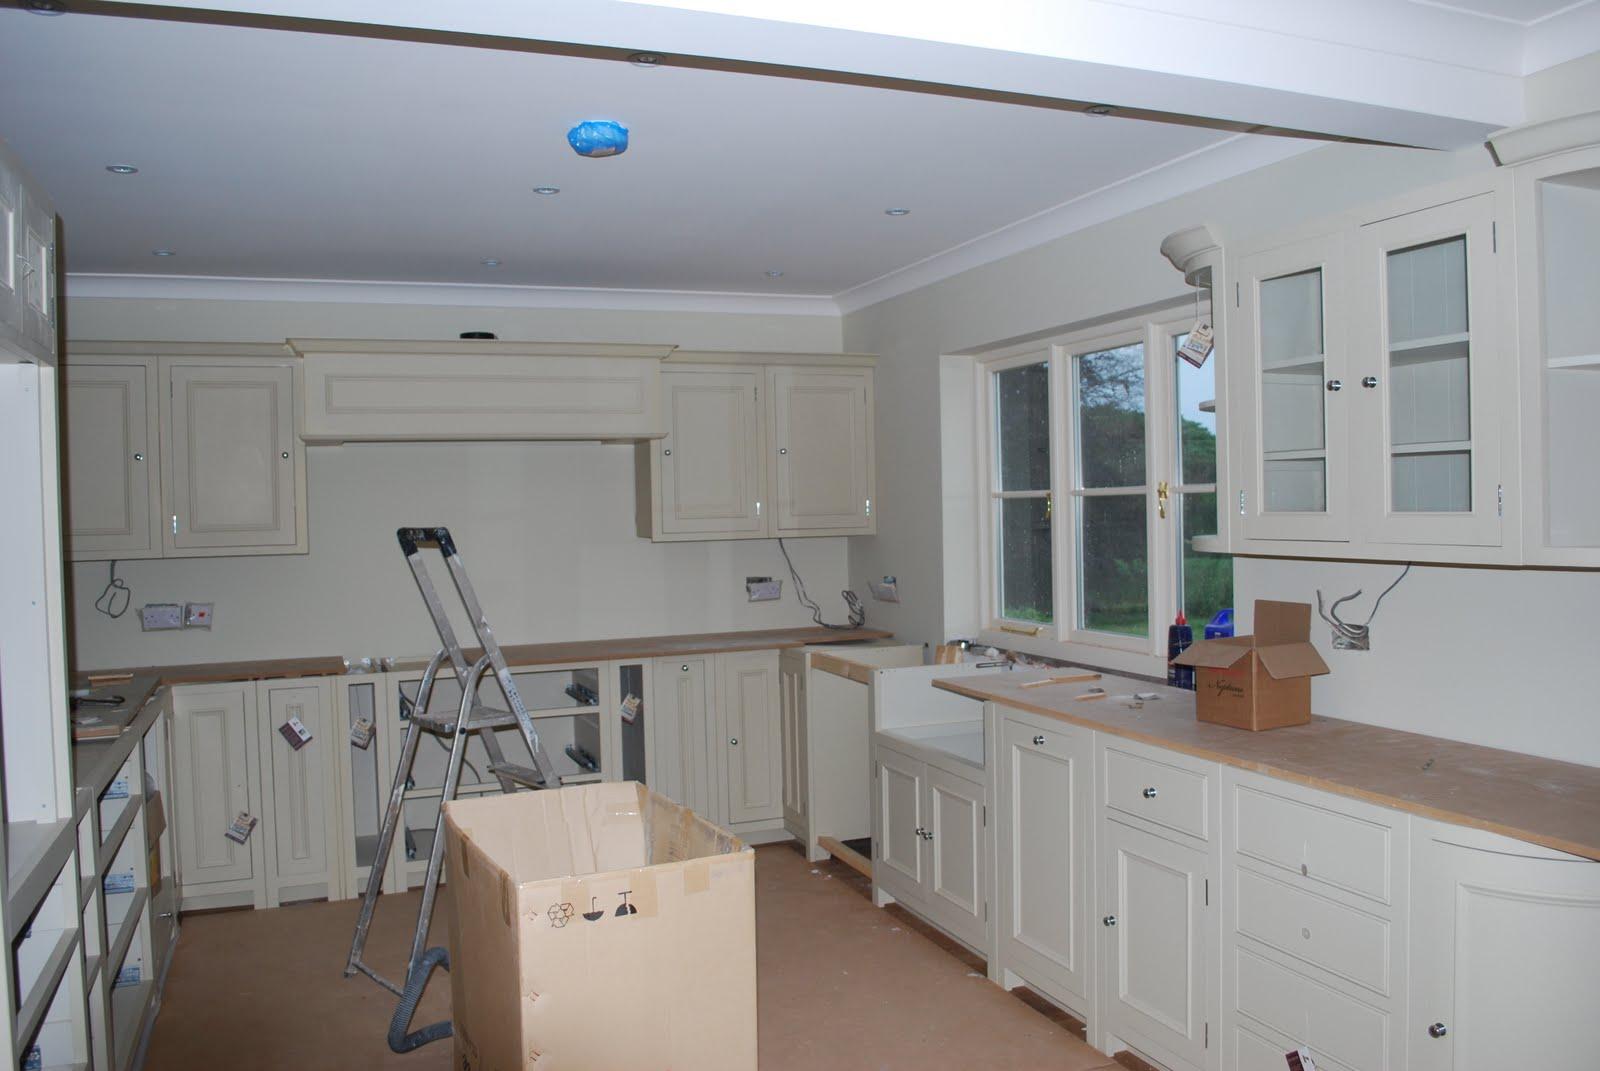 Internal Knock Through Between Kitchen And Dining Room: Kitchen Diner V Kitchn And Dining Room?